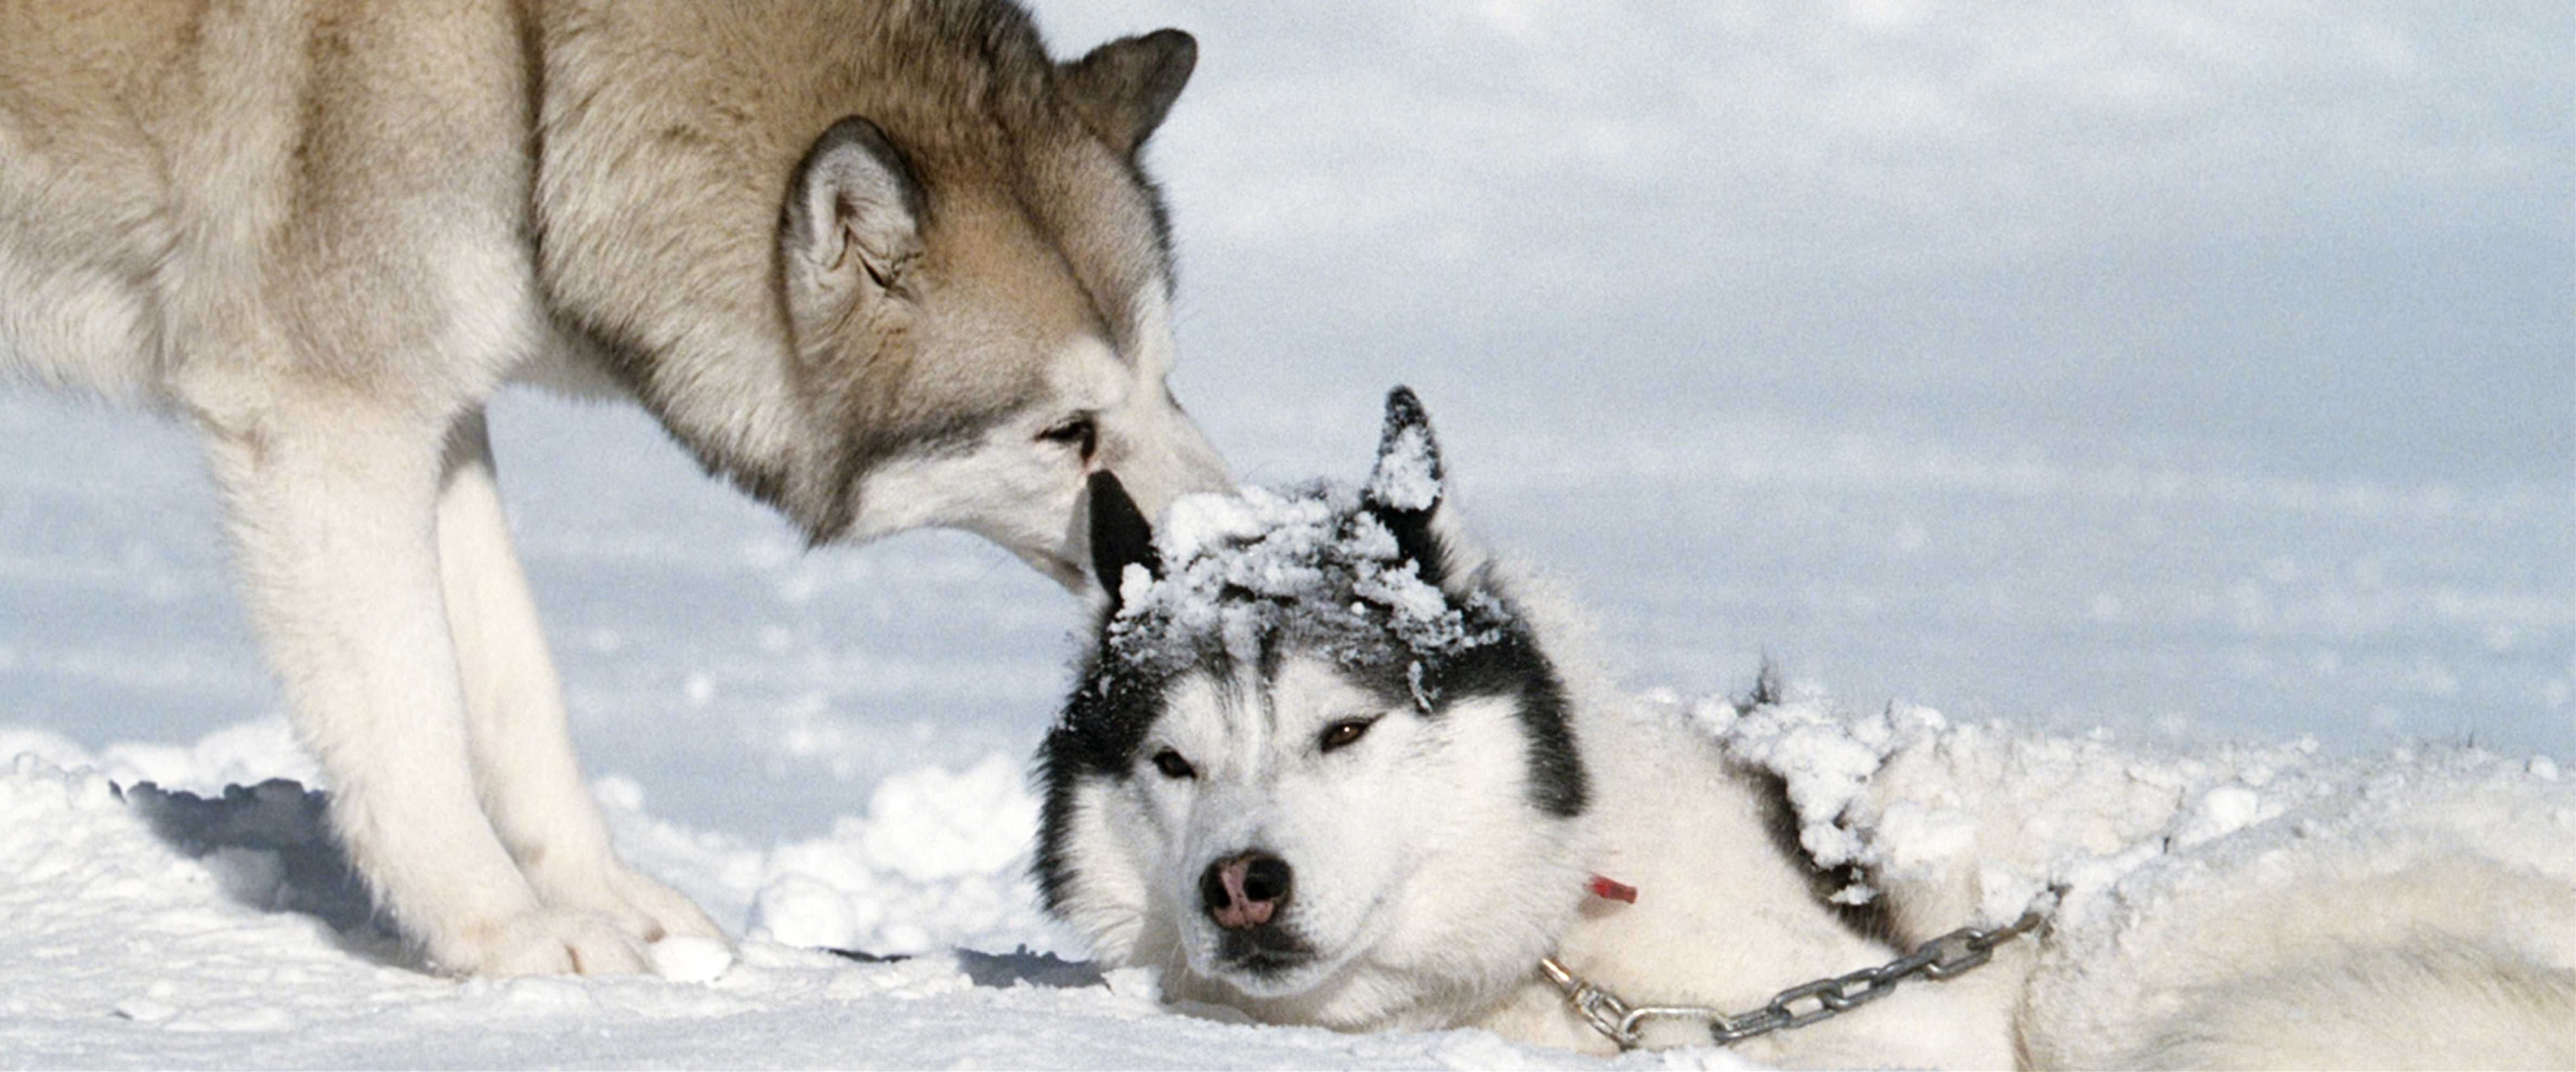 Pin By Anureetkaurriti On Puppies In 2020 Husky Dog Sledding Siberian Husky